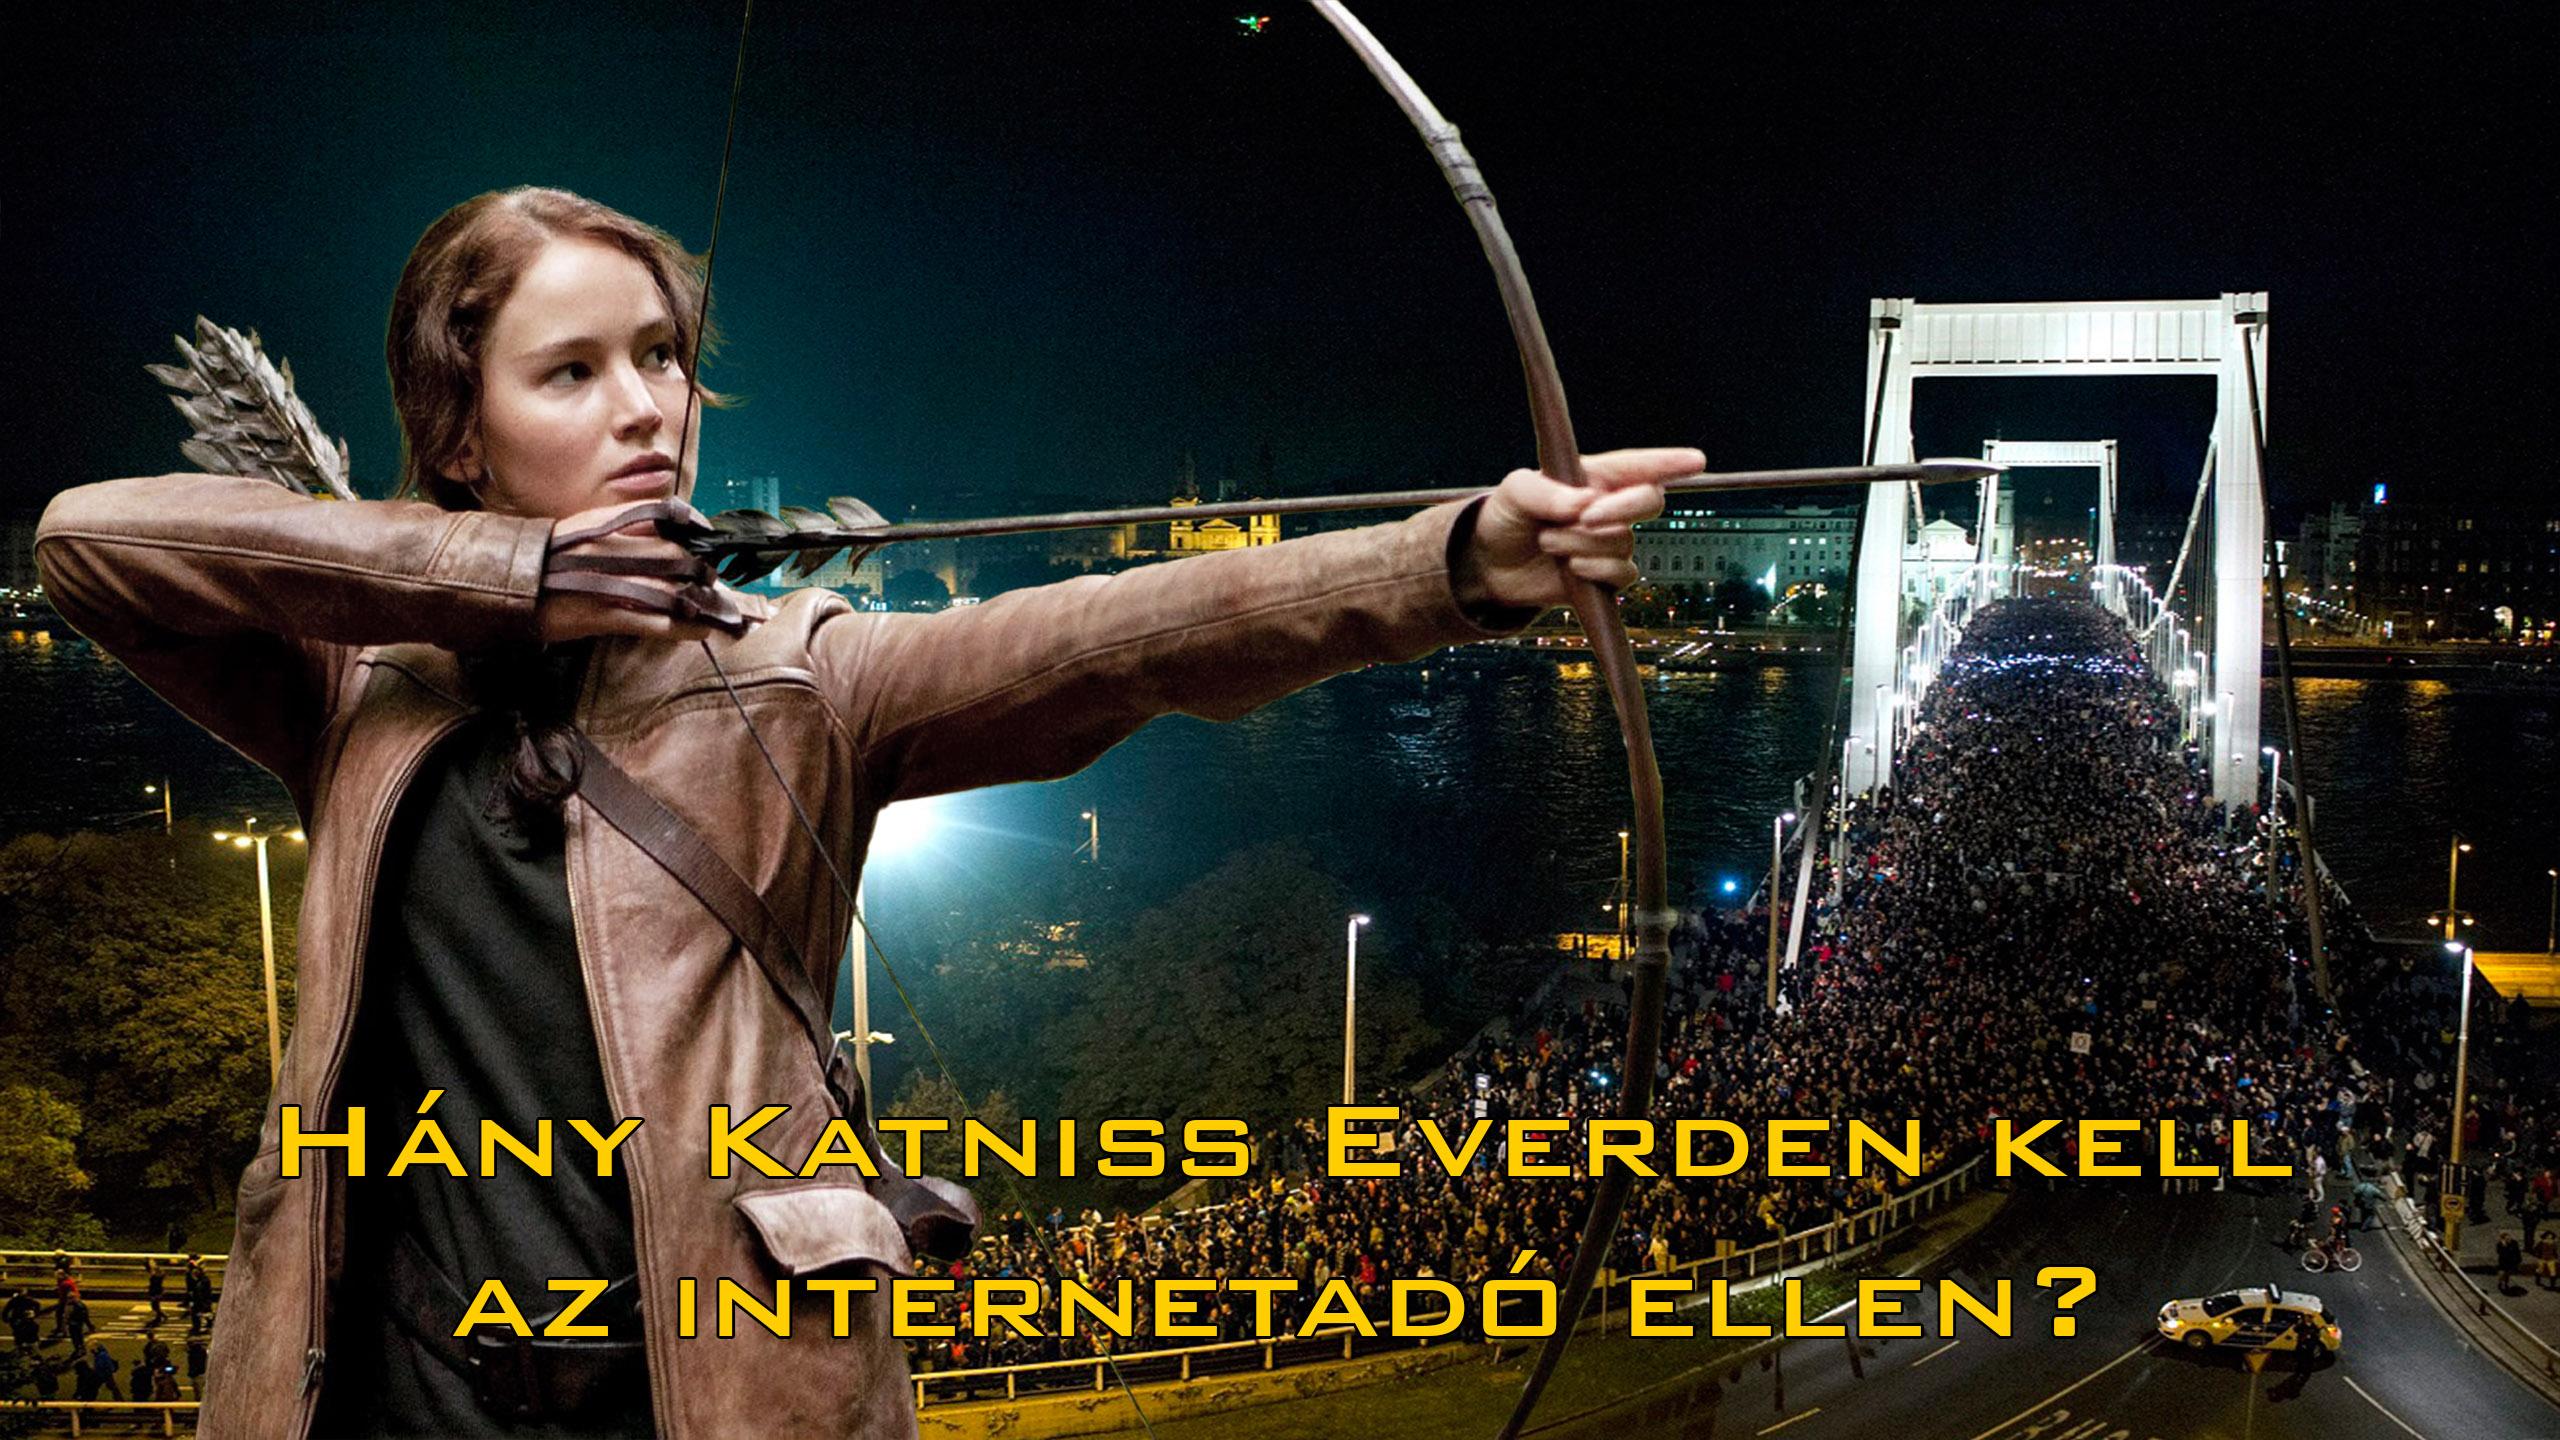 katniss_everdeen_lead kep.jpg